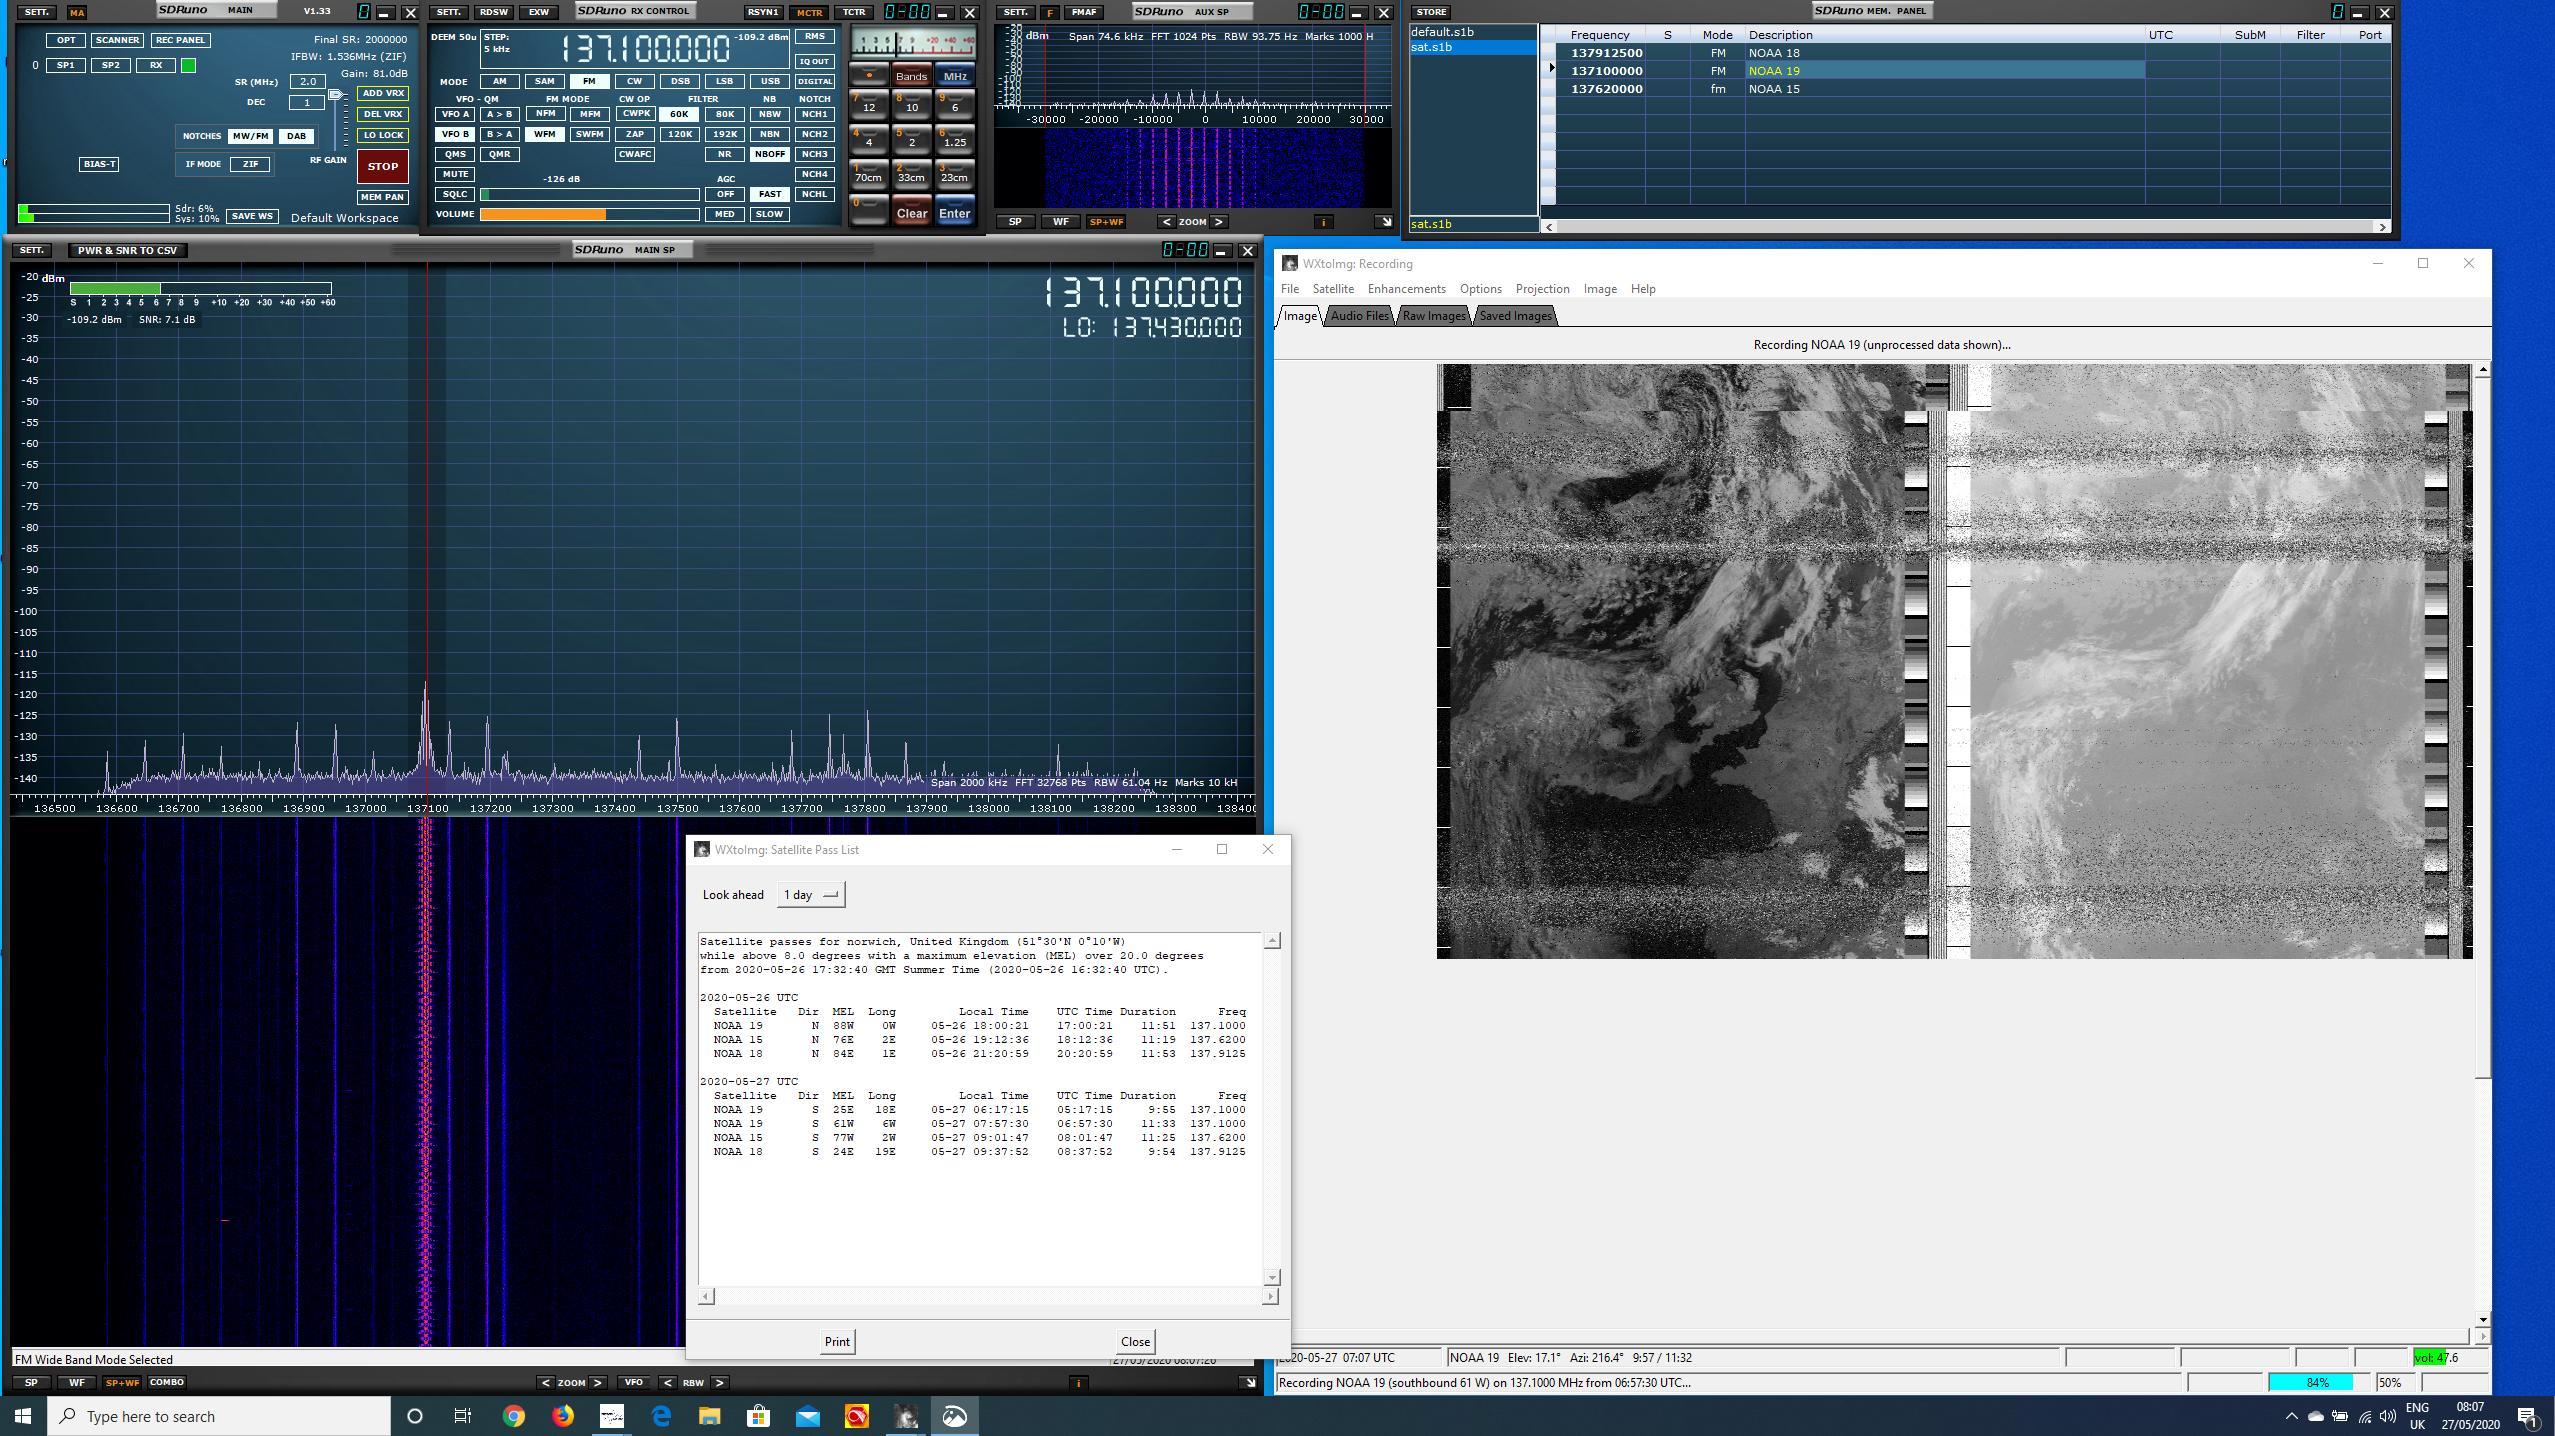 Windows desktop with SDRuno and wxtoimg